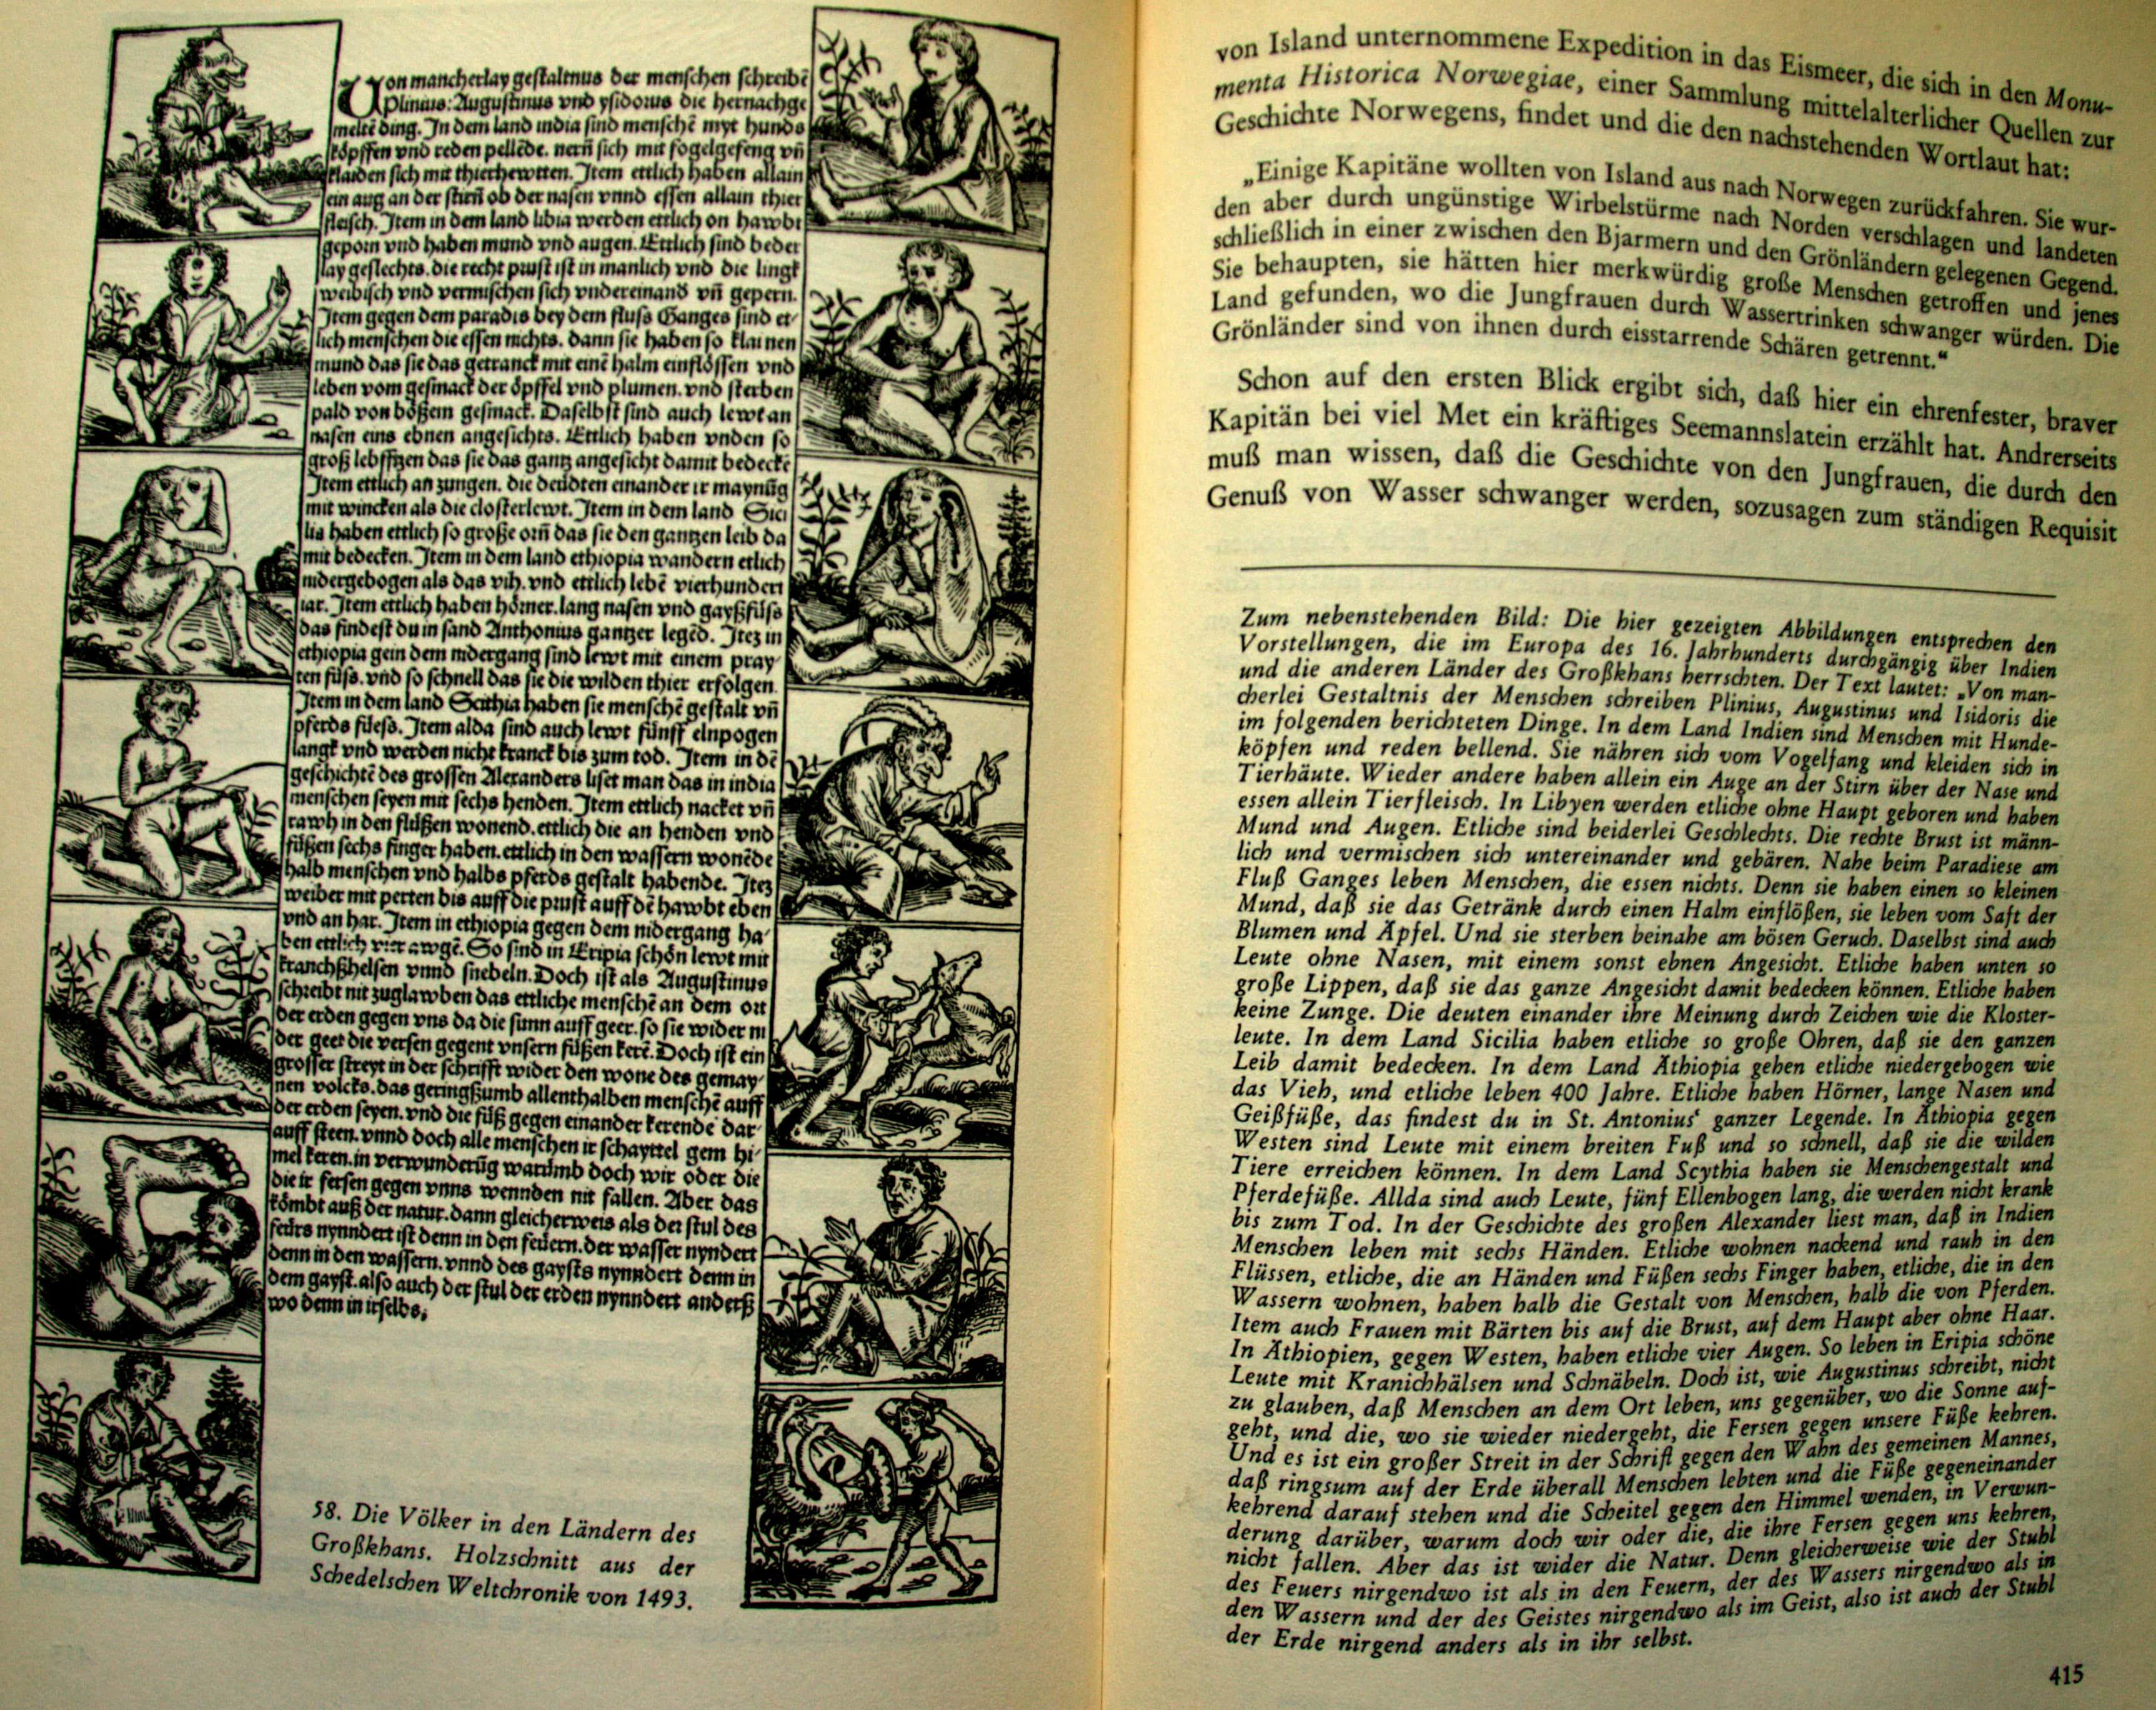 Die Völker in den Ländern des Großkhans - Holzschnitt - 1493